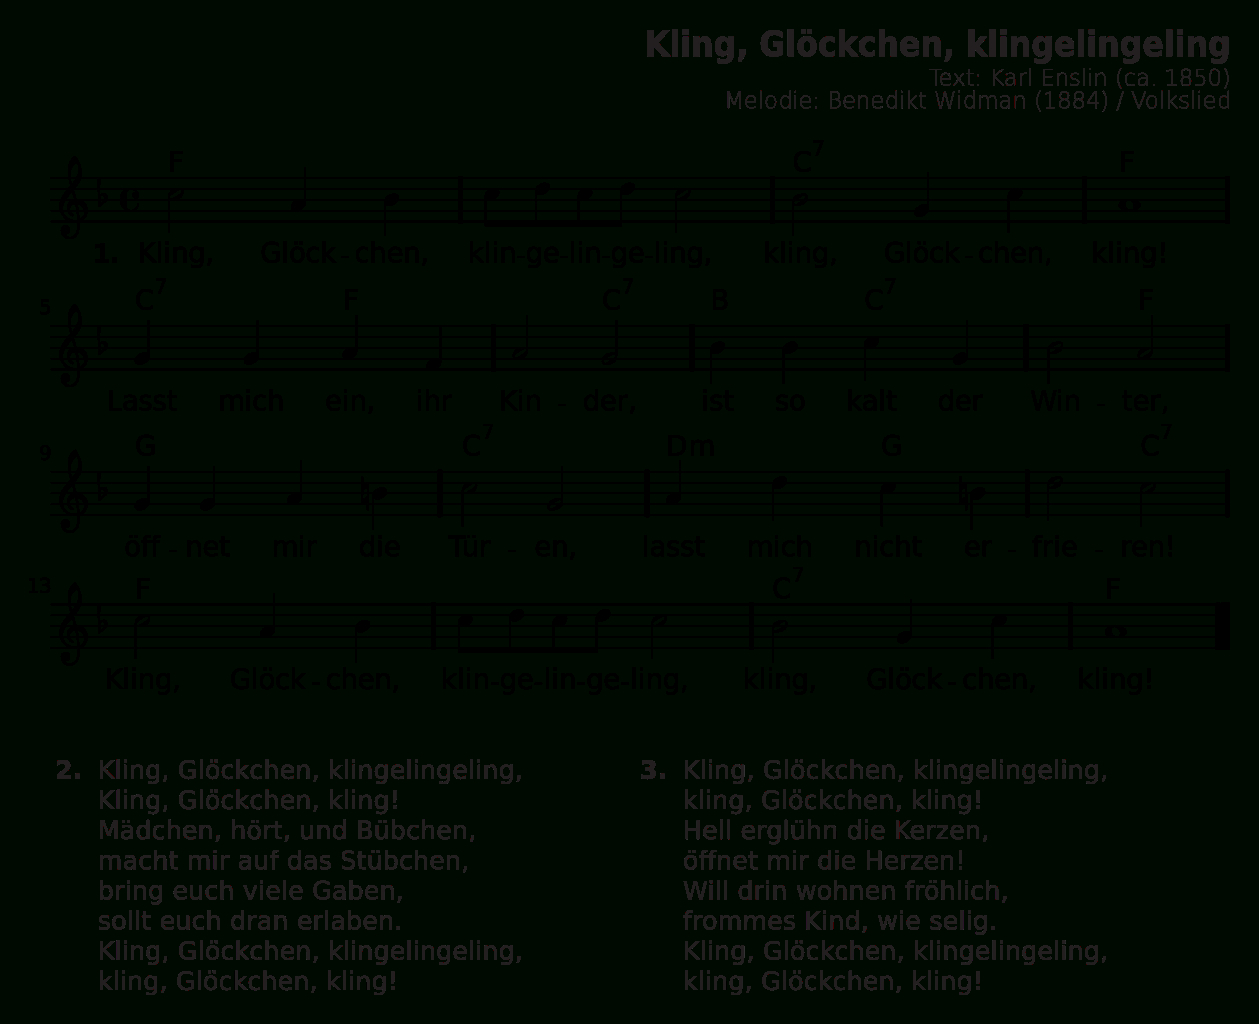 Datei:kling, Glöckchen, Klingelingeling.svg – Wikipedia verwandt mit Kling Glöckchen Klingelingeling Text